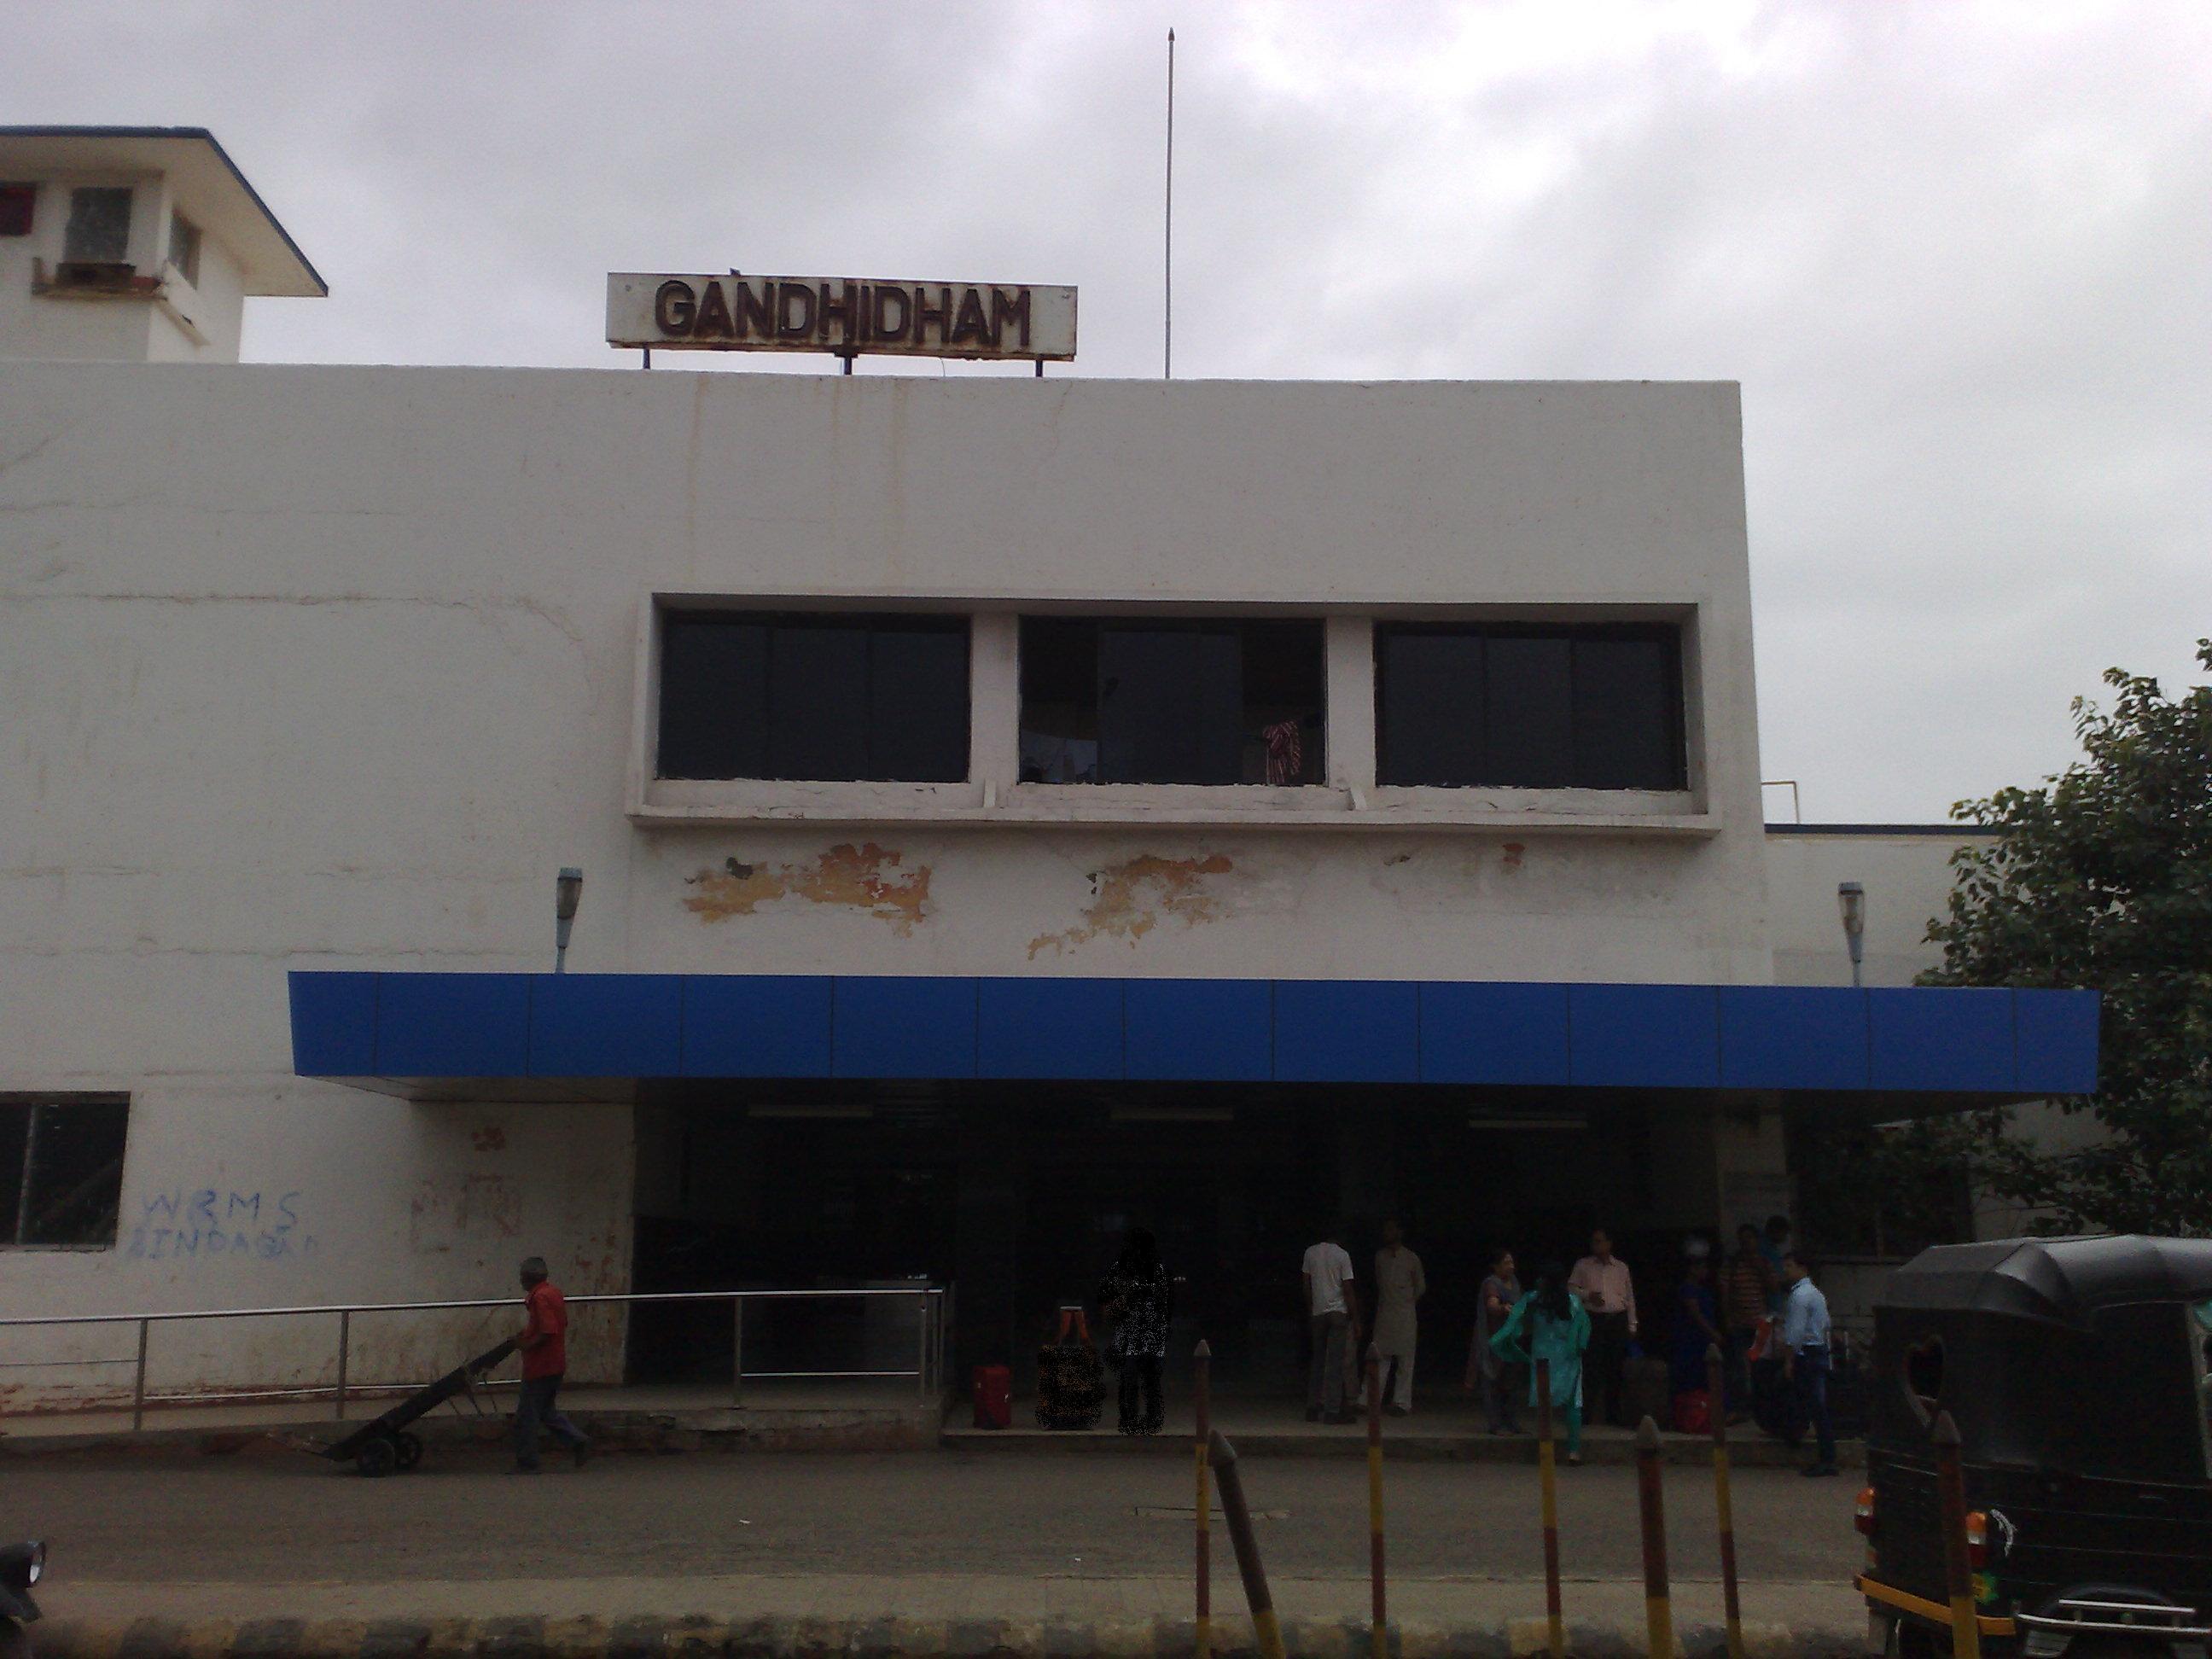 gandhidham junction main entrance.jpg